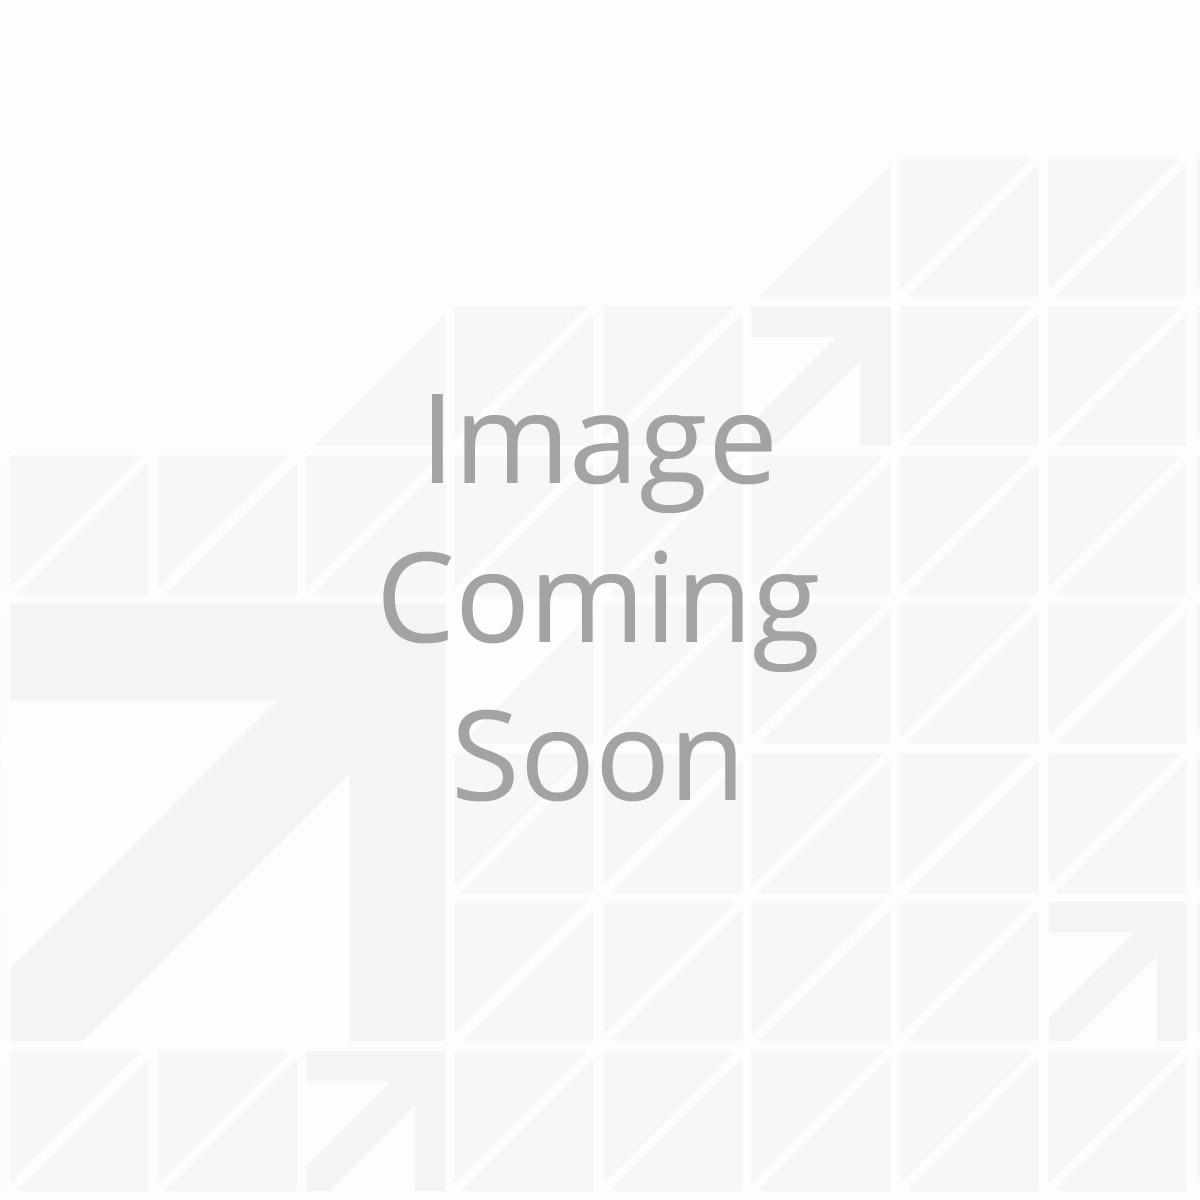 19' Power & Hybrid Awning Roller Assembly - Prepflex Black Fade